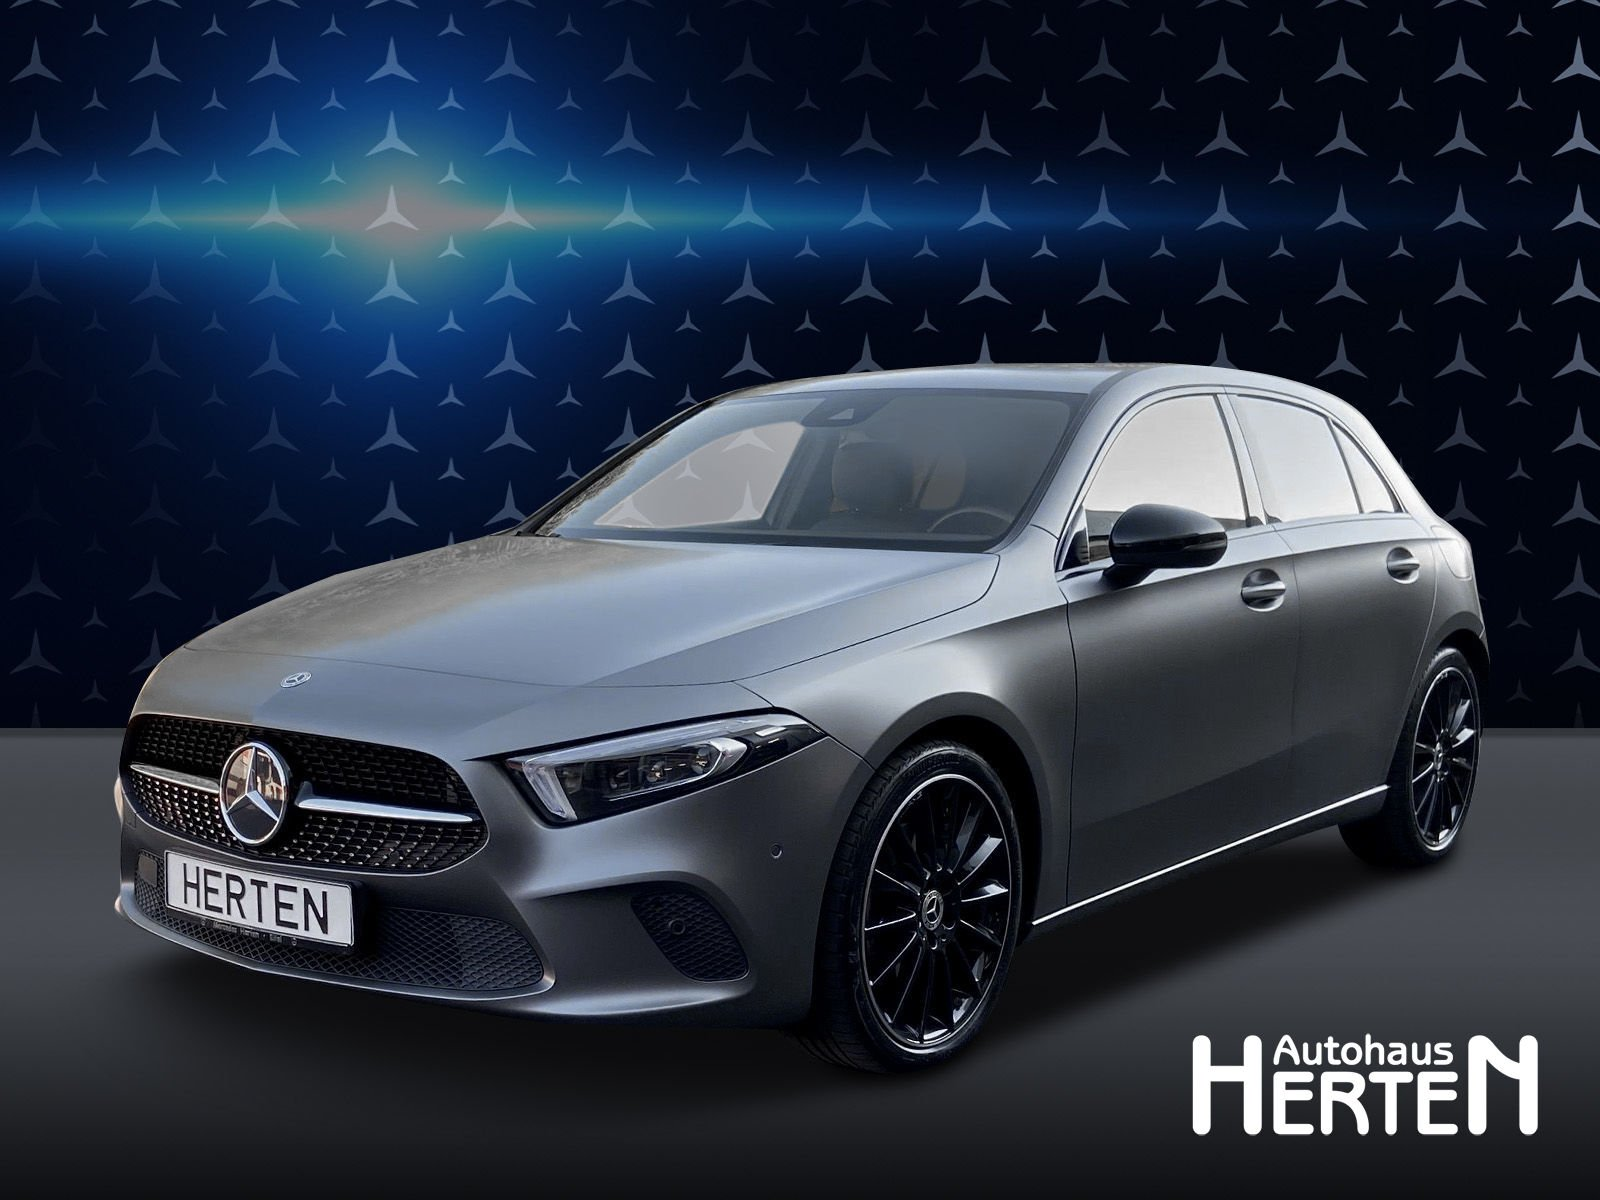 Mercedes-Benz A 250 PROGRESSIVE+NIGHT+MULTIBEAM+NAVI PREMIUM, Jahr 2018, Benzin